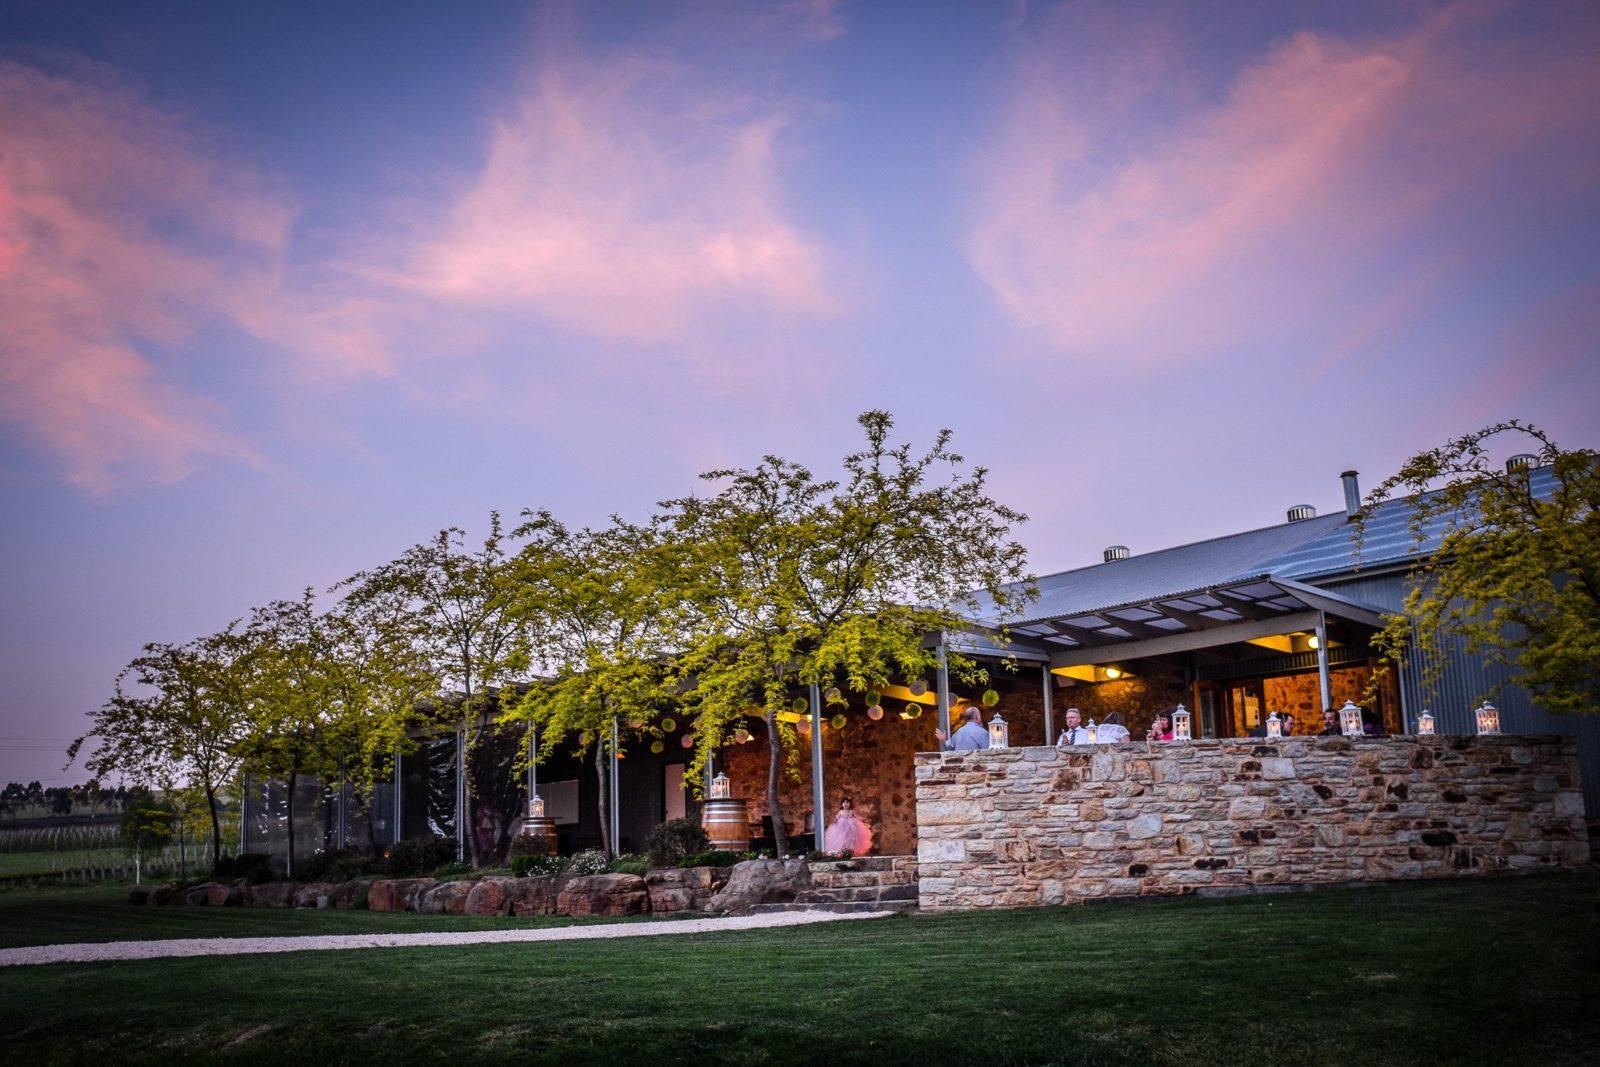 Howard Vineyard, Nairne, Adelaide Hills, South Australia